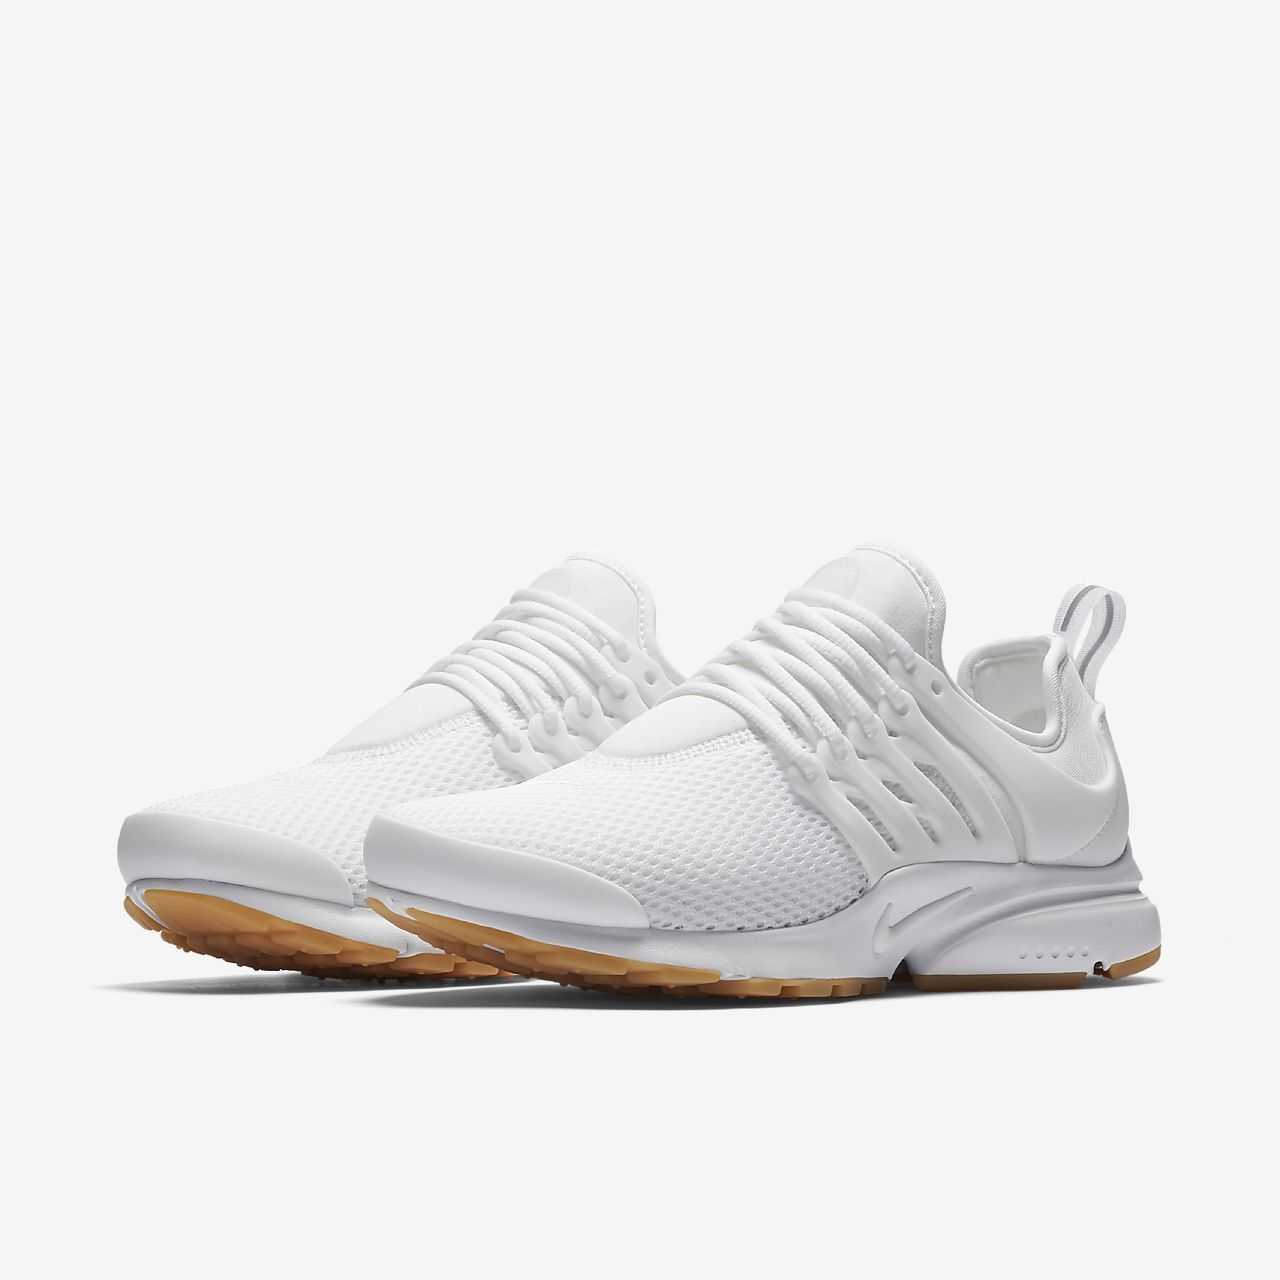 Nike air presto white, Presto sneakers